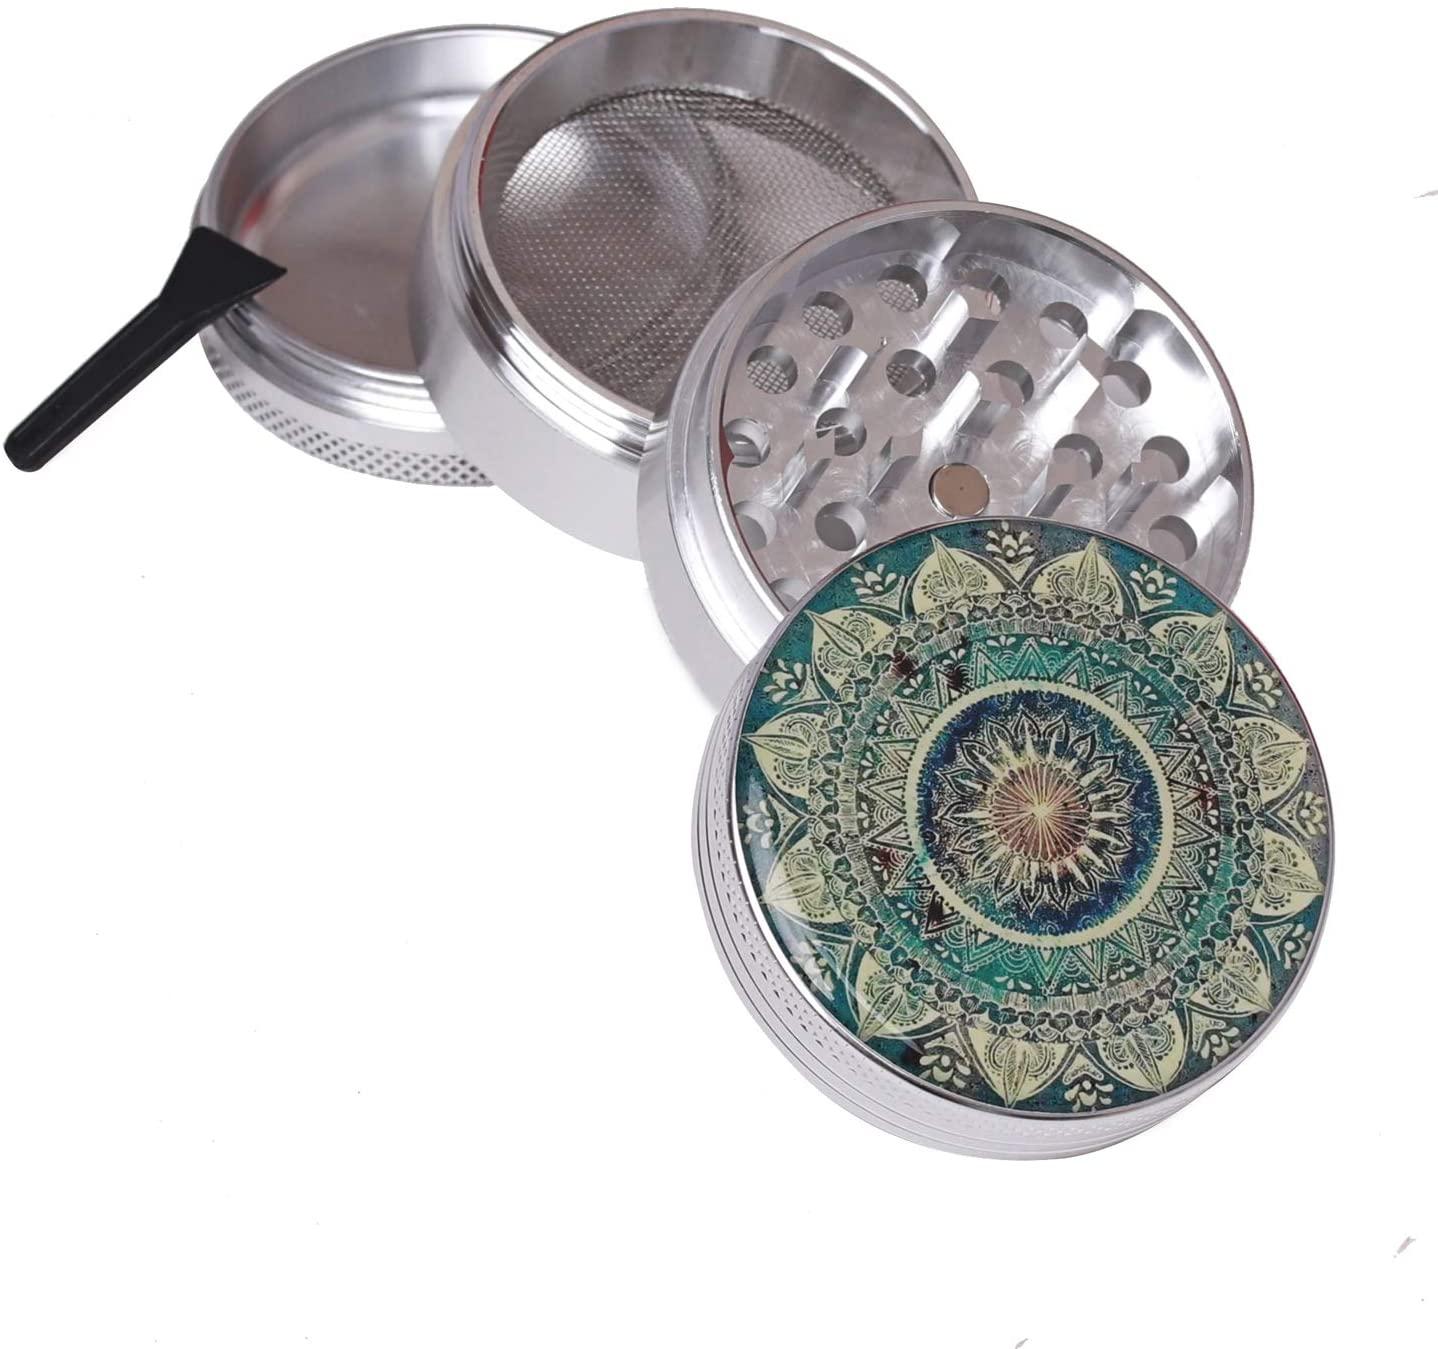 BrightTea Grinders, Best Herb Grinder 2.0 Inch 4-piece Aluminum Alloy With Pollen Catcher Blue Mandala–White